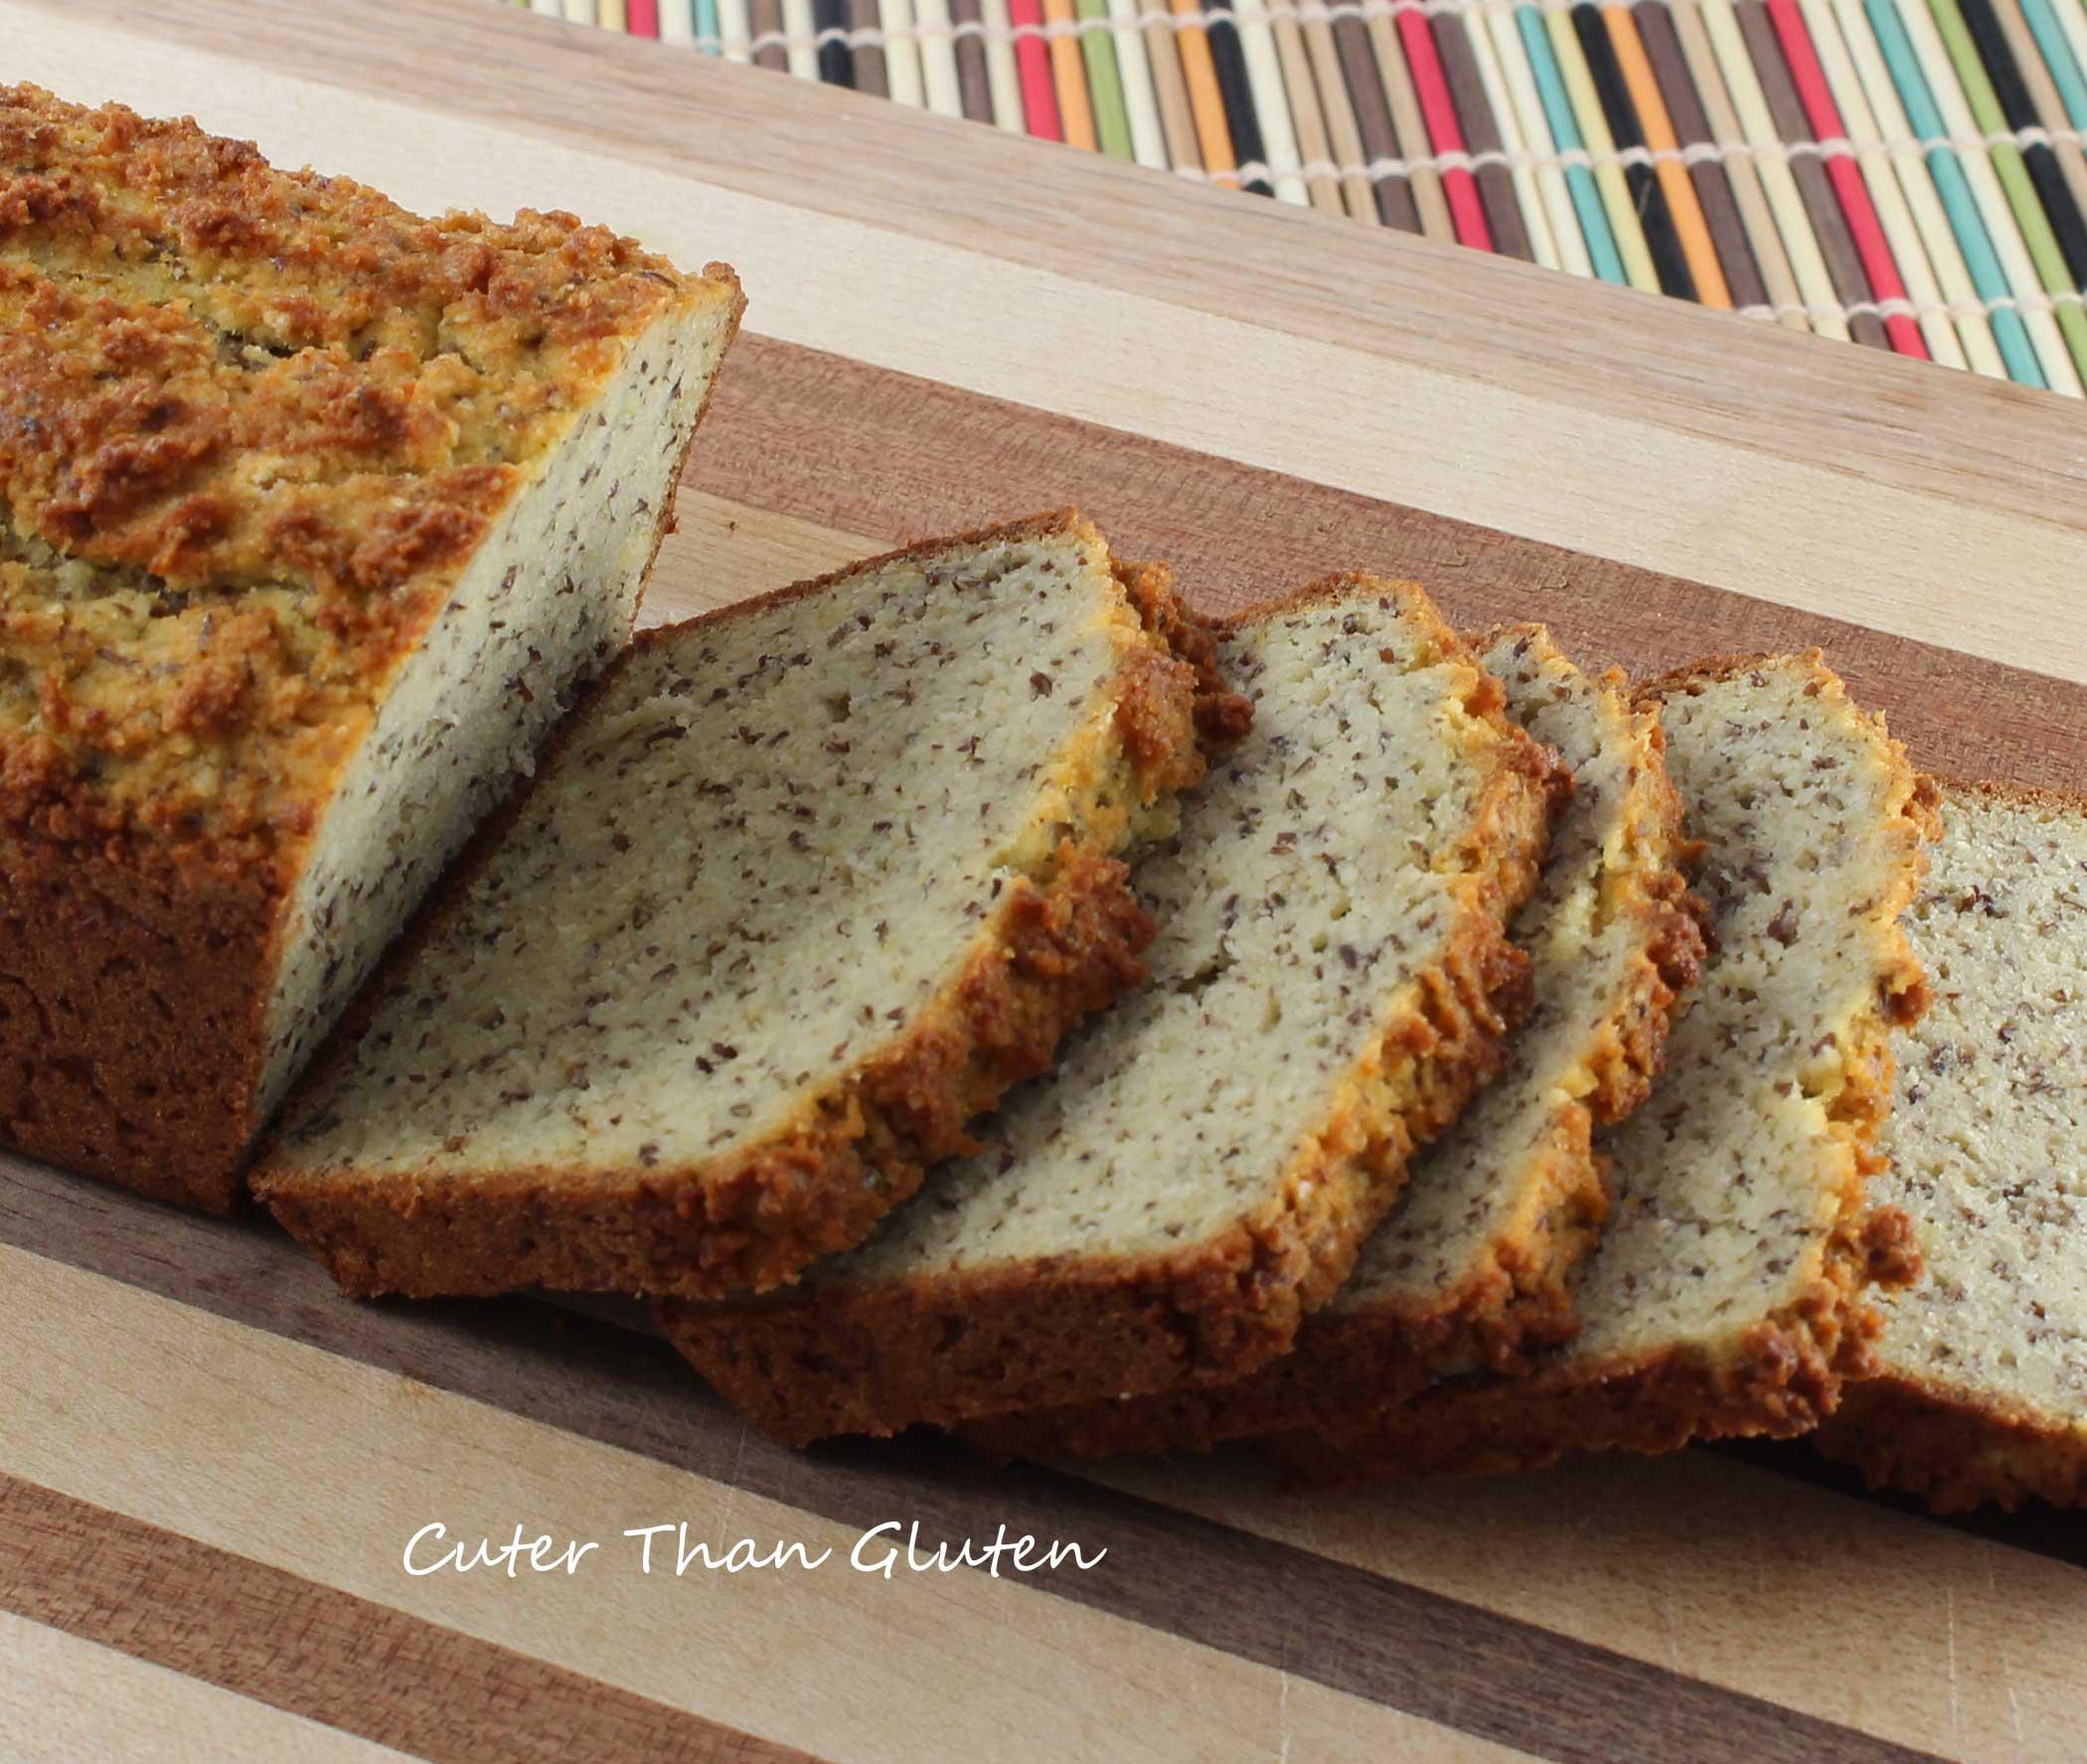 carrot cake gluten-free recipe